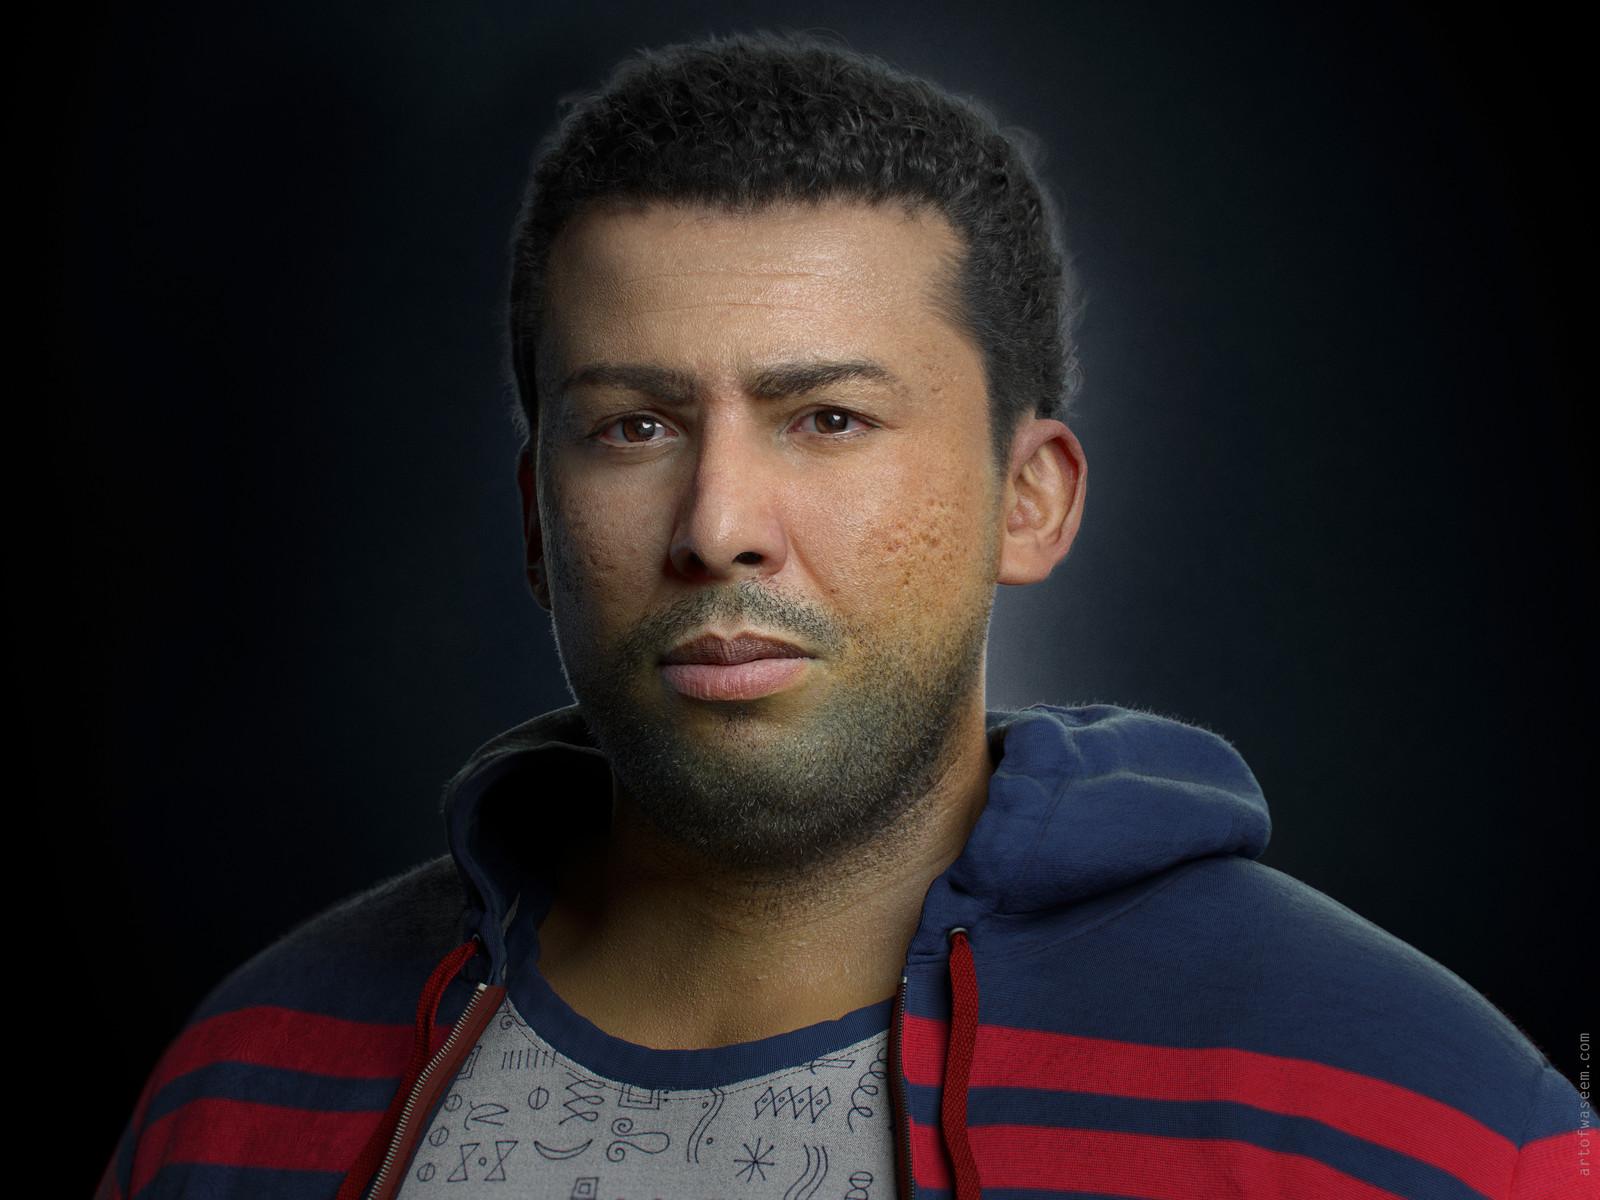 Portrait of Kareem Sultan